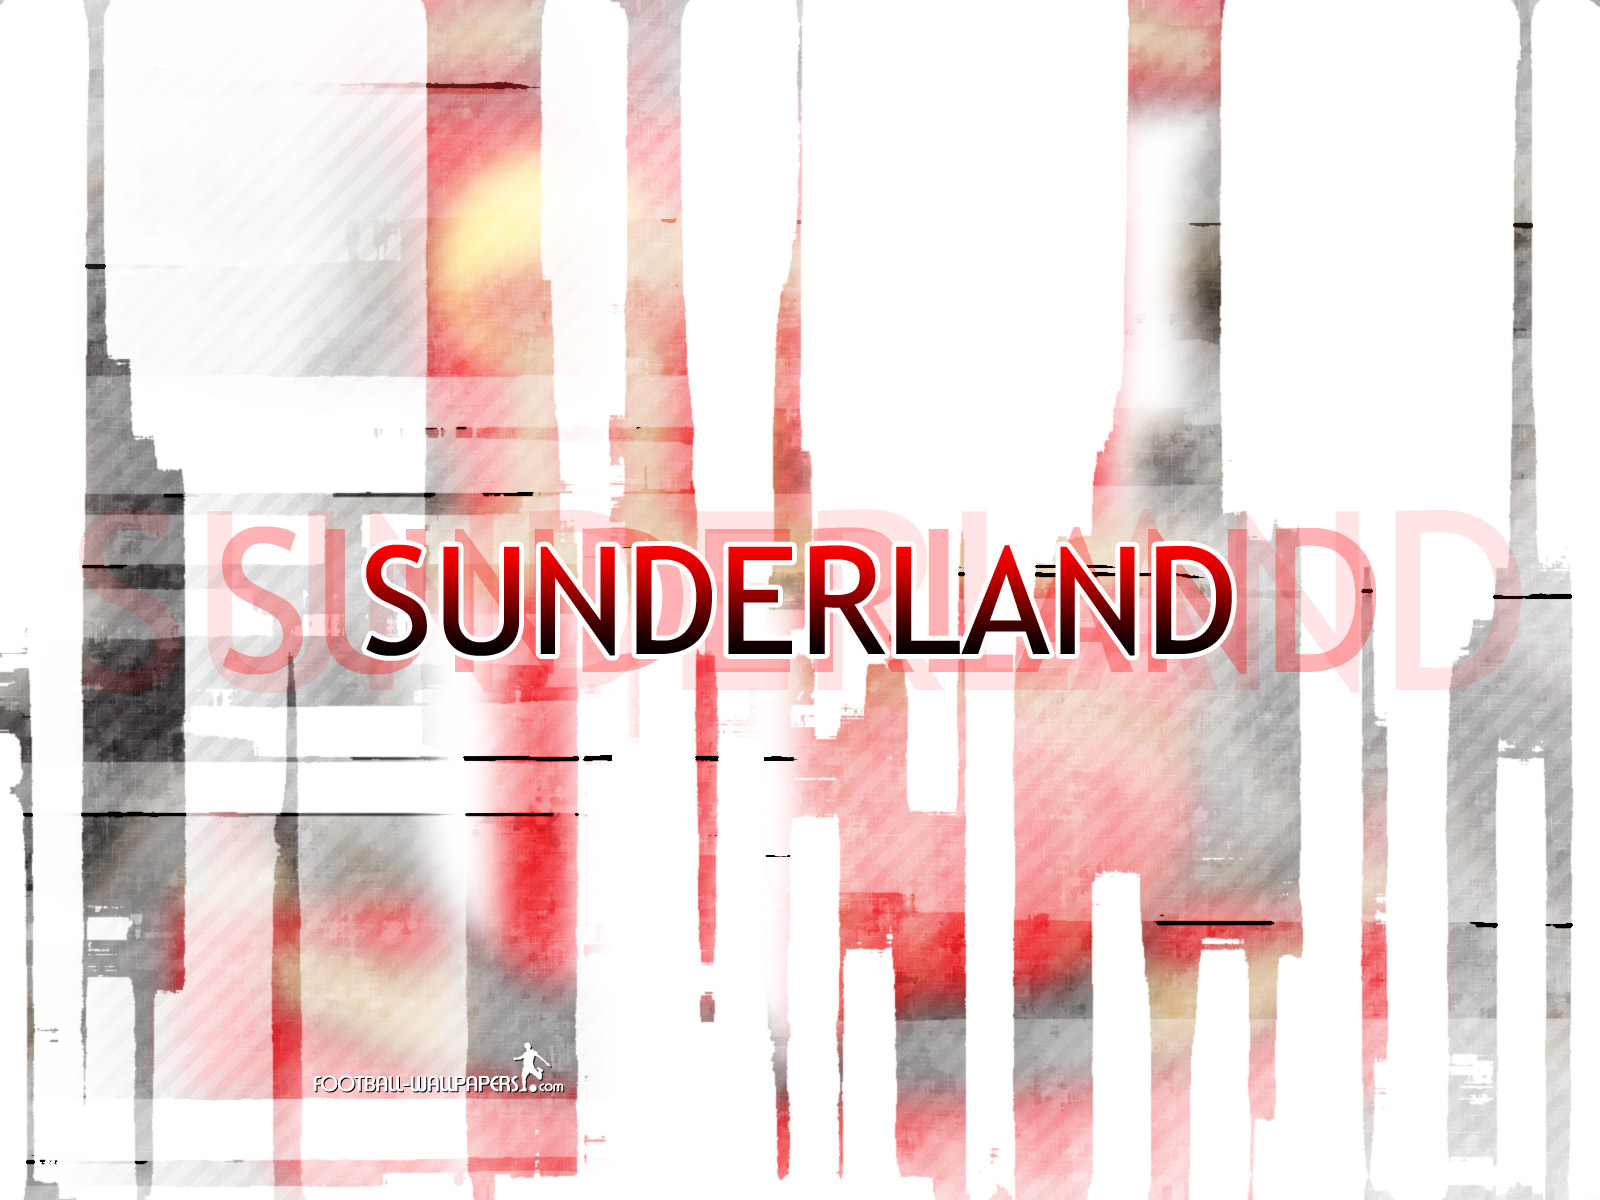 Wallpaper Free Picture: Sunderland Wallpaper 2011